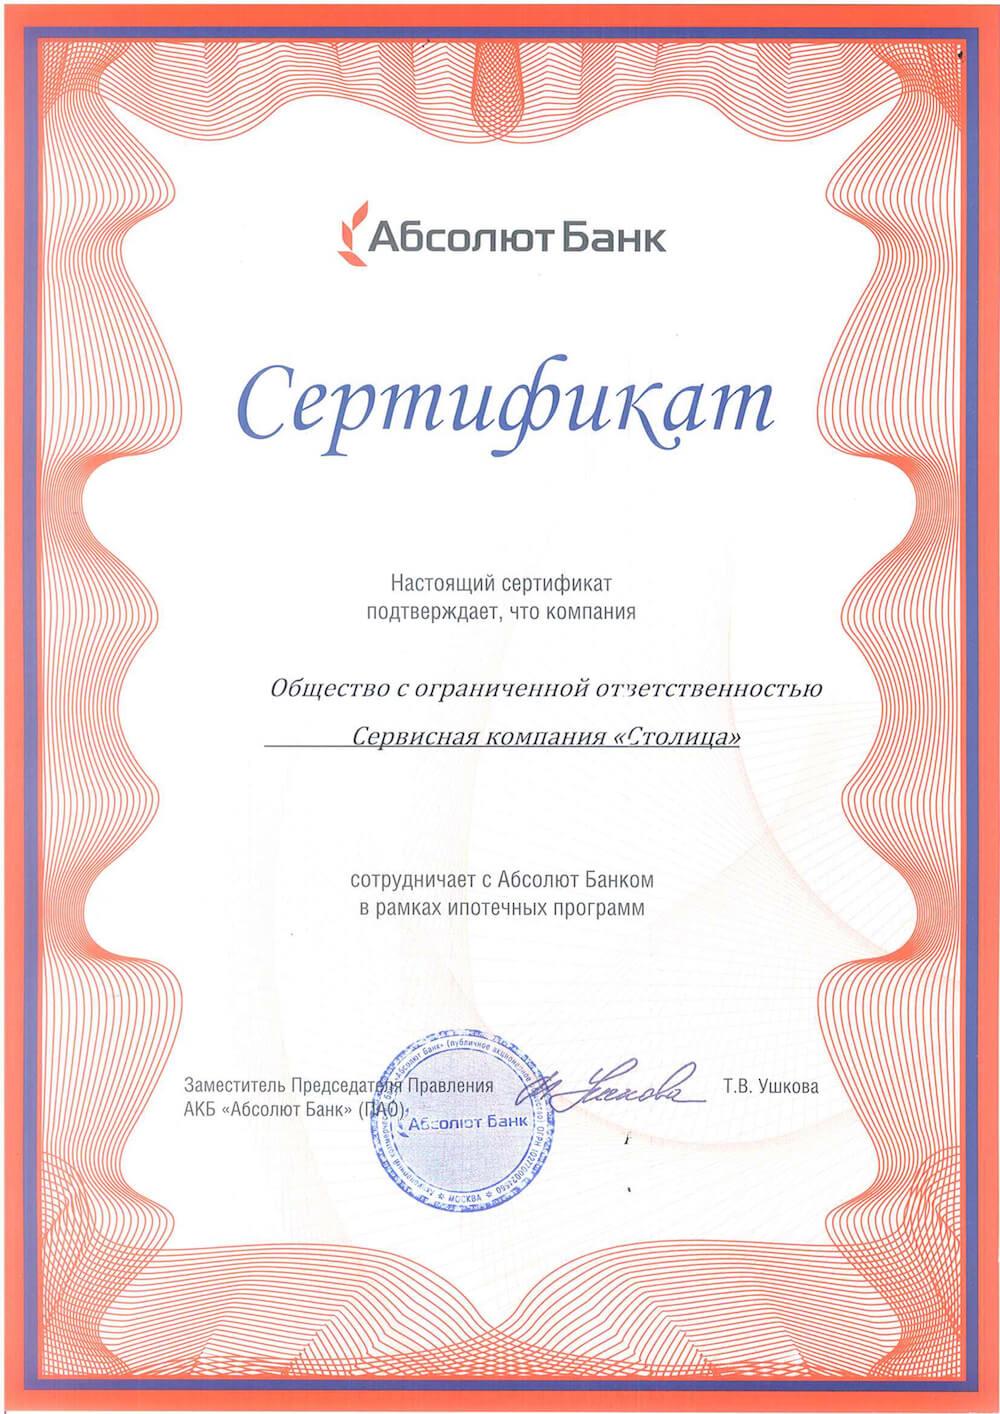 Сертификат АбсолютБанка